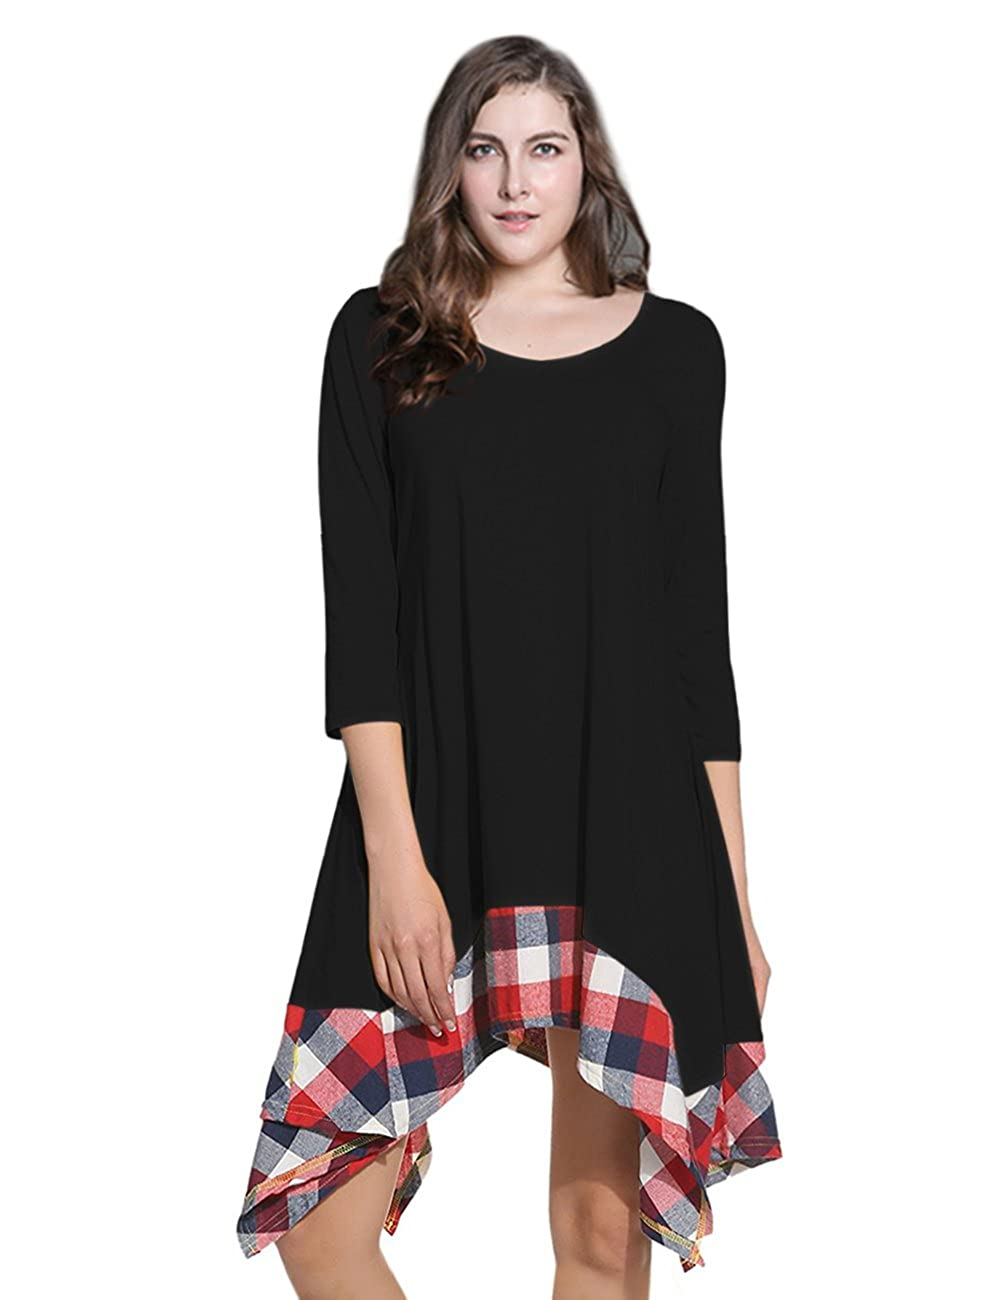 AMZ PLUS Women Irregular Hem Long Sleeve Loose Shirt Dress Top X2-Q3U1-P2F8